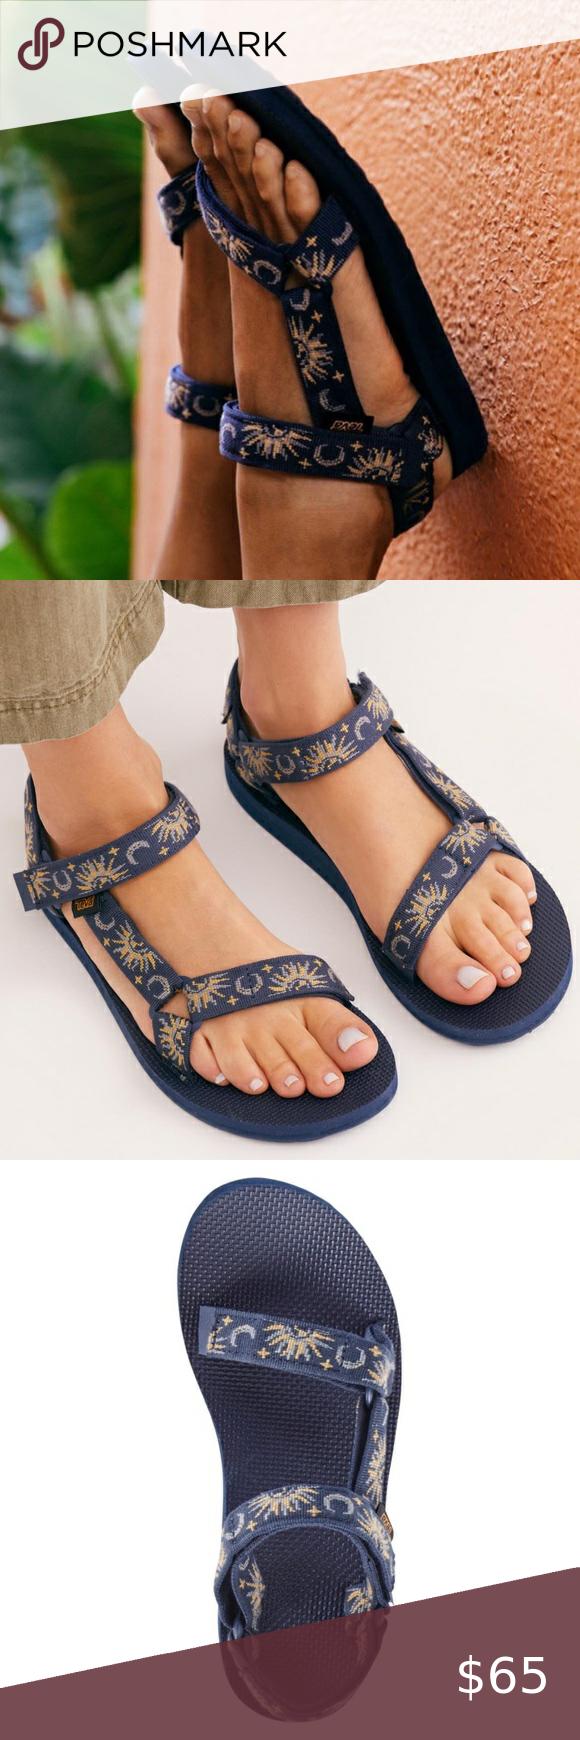 Nib Celestial Sun Moon Teva Sandals In 2020 Teva Sandals Teva Teva Shoes